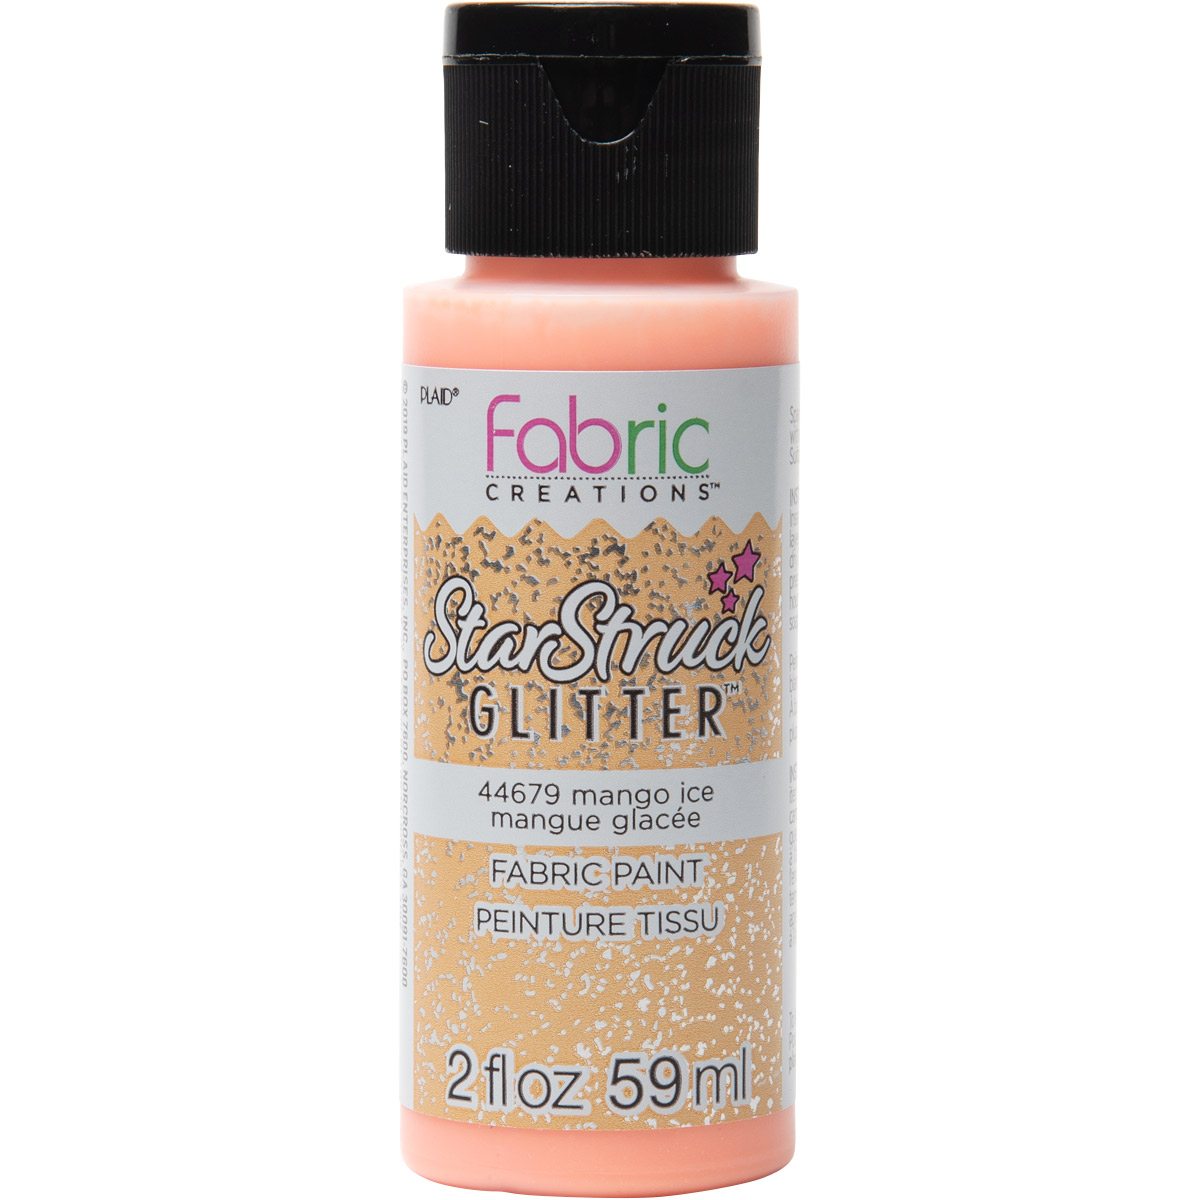 Fabric Creations™ StarStruck Glitter™ Fabric Paint - Mango Ice, 2 oz.